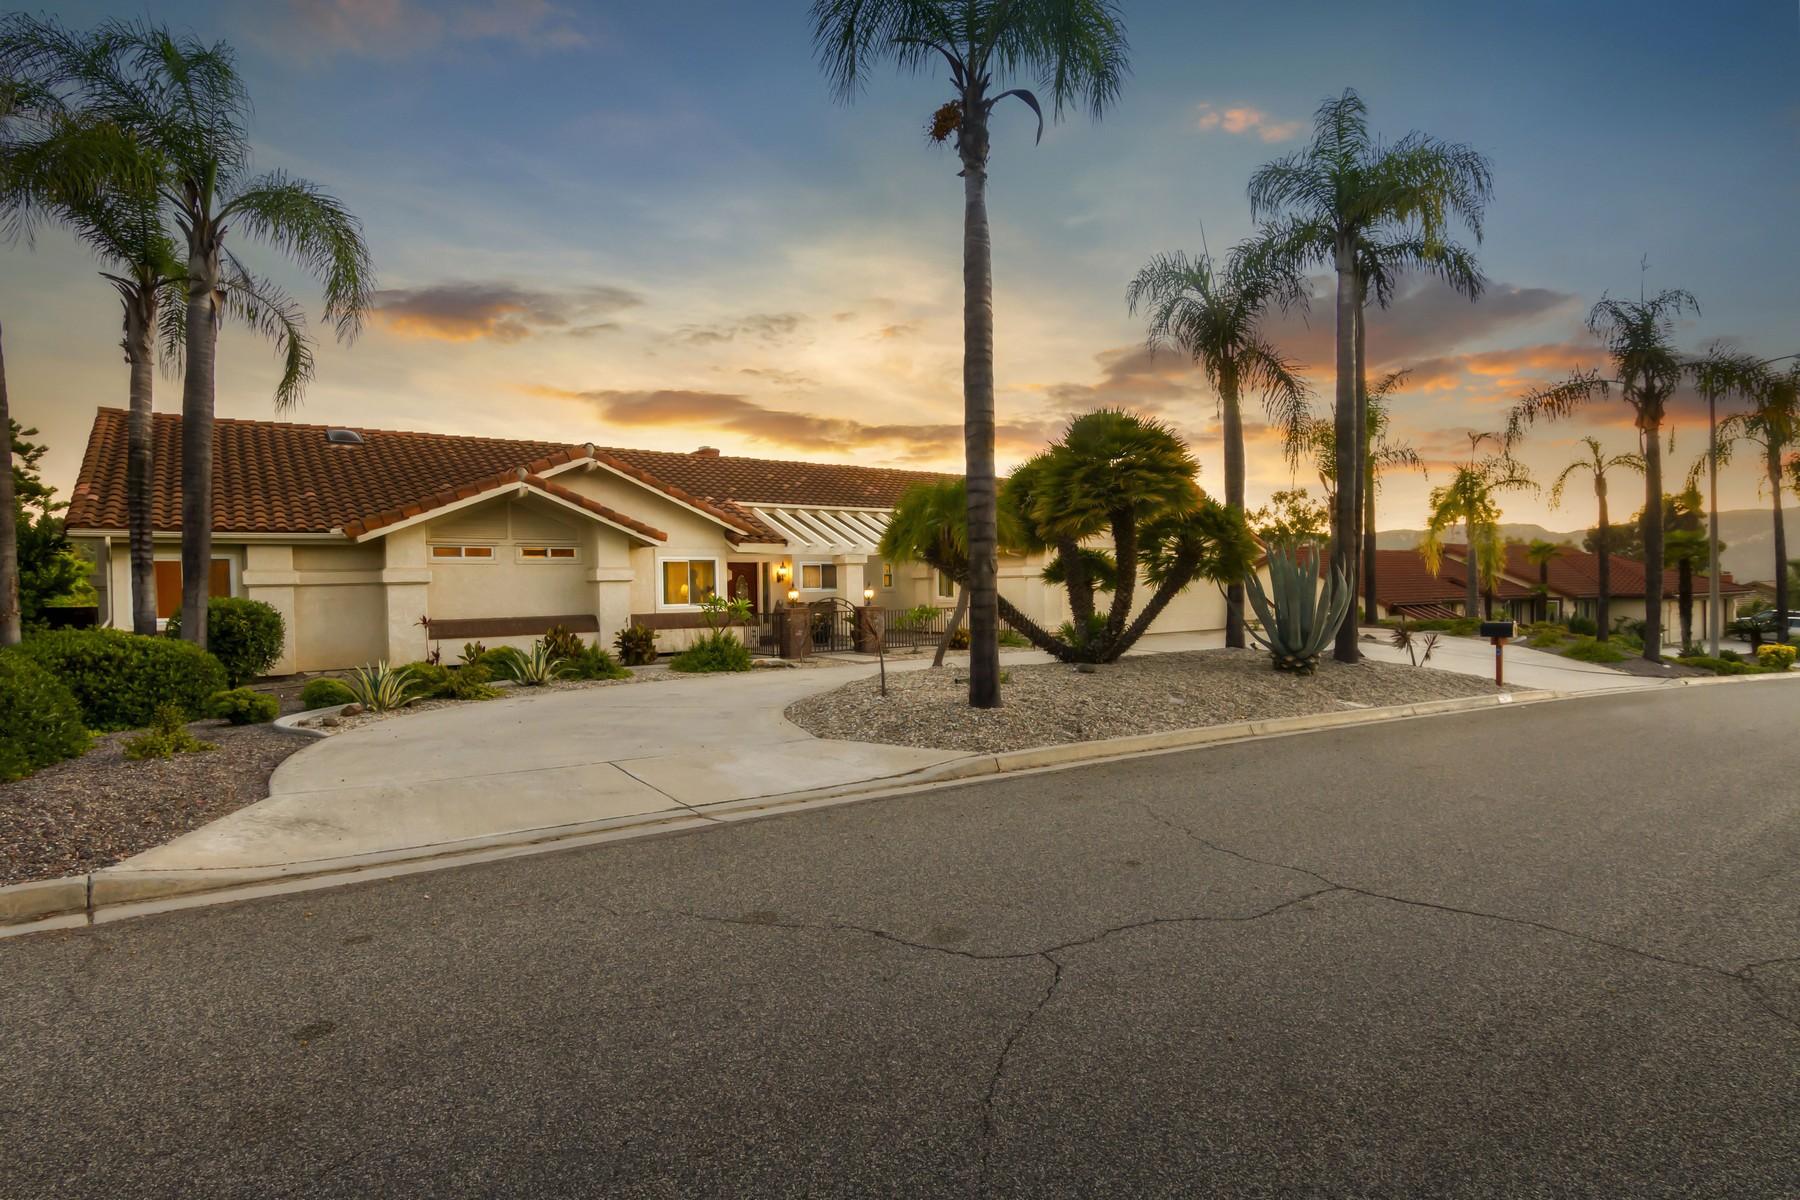 Single Family Homes for Sale at 1425 Cortina Circle Escondido, California 92029 United States